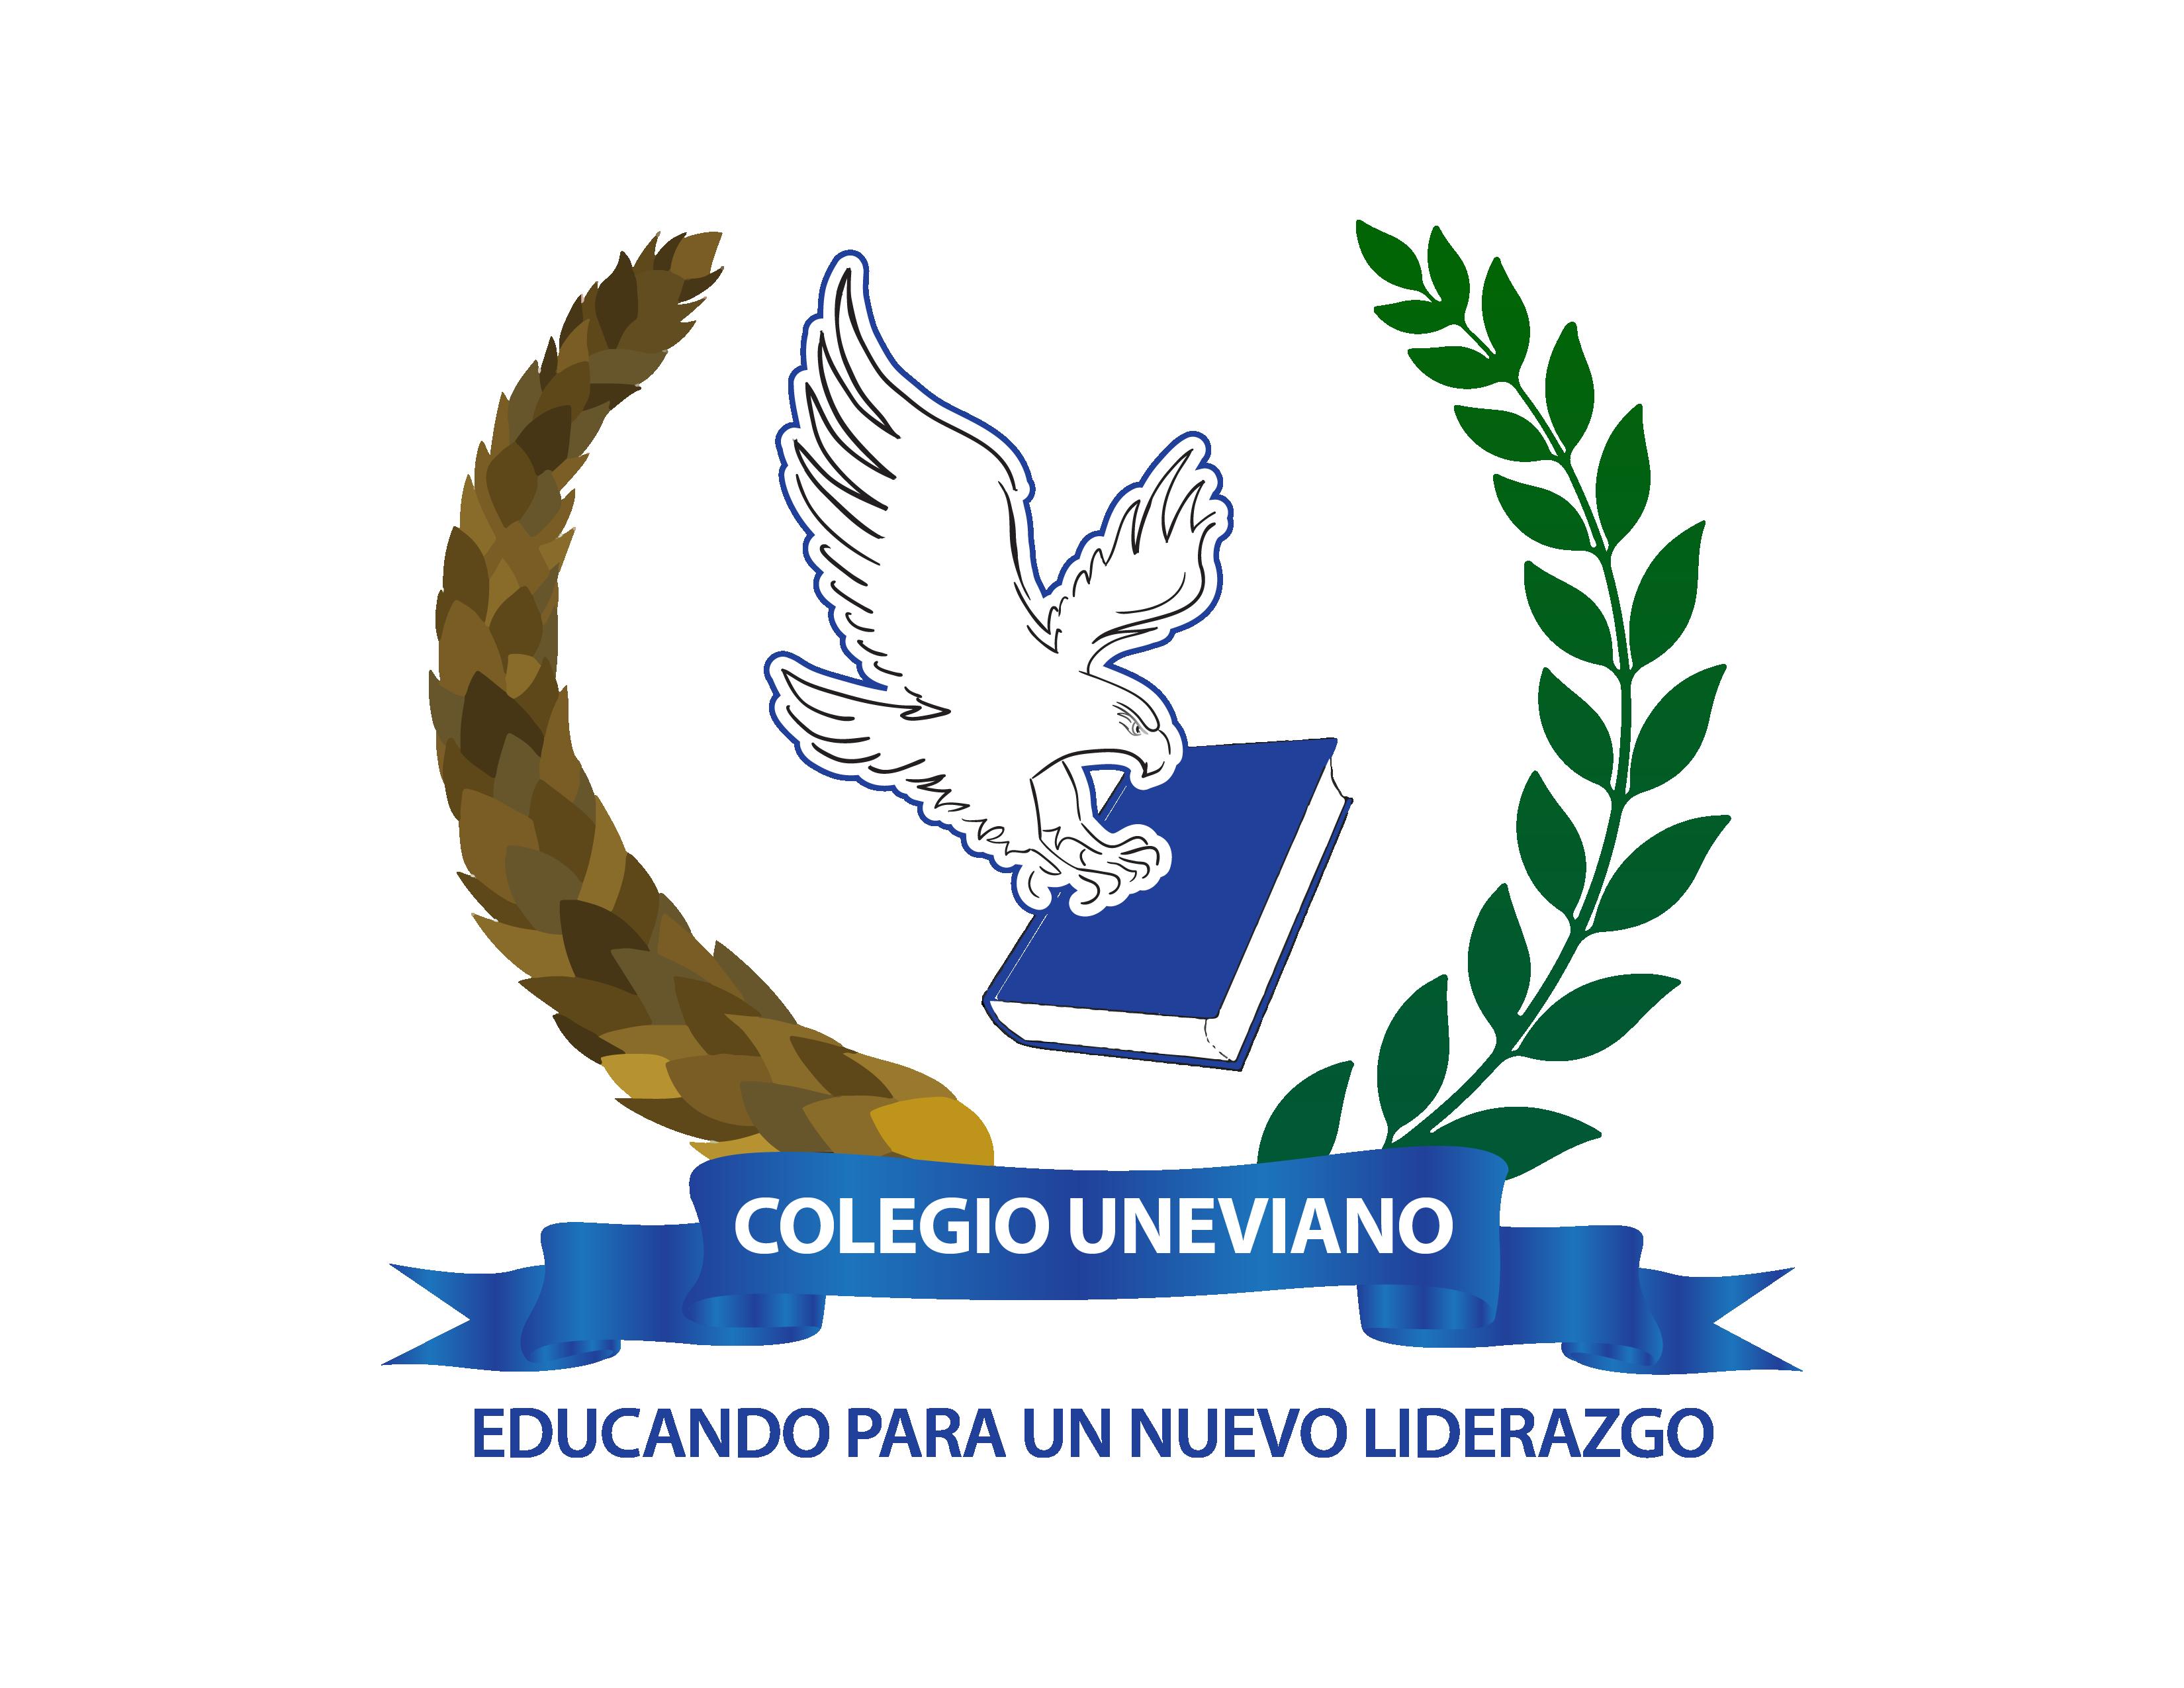 LOGO COLEGIO UNEVIANO 7